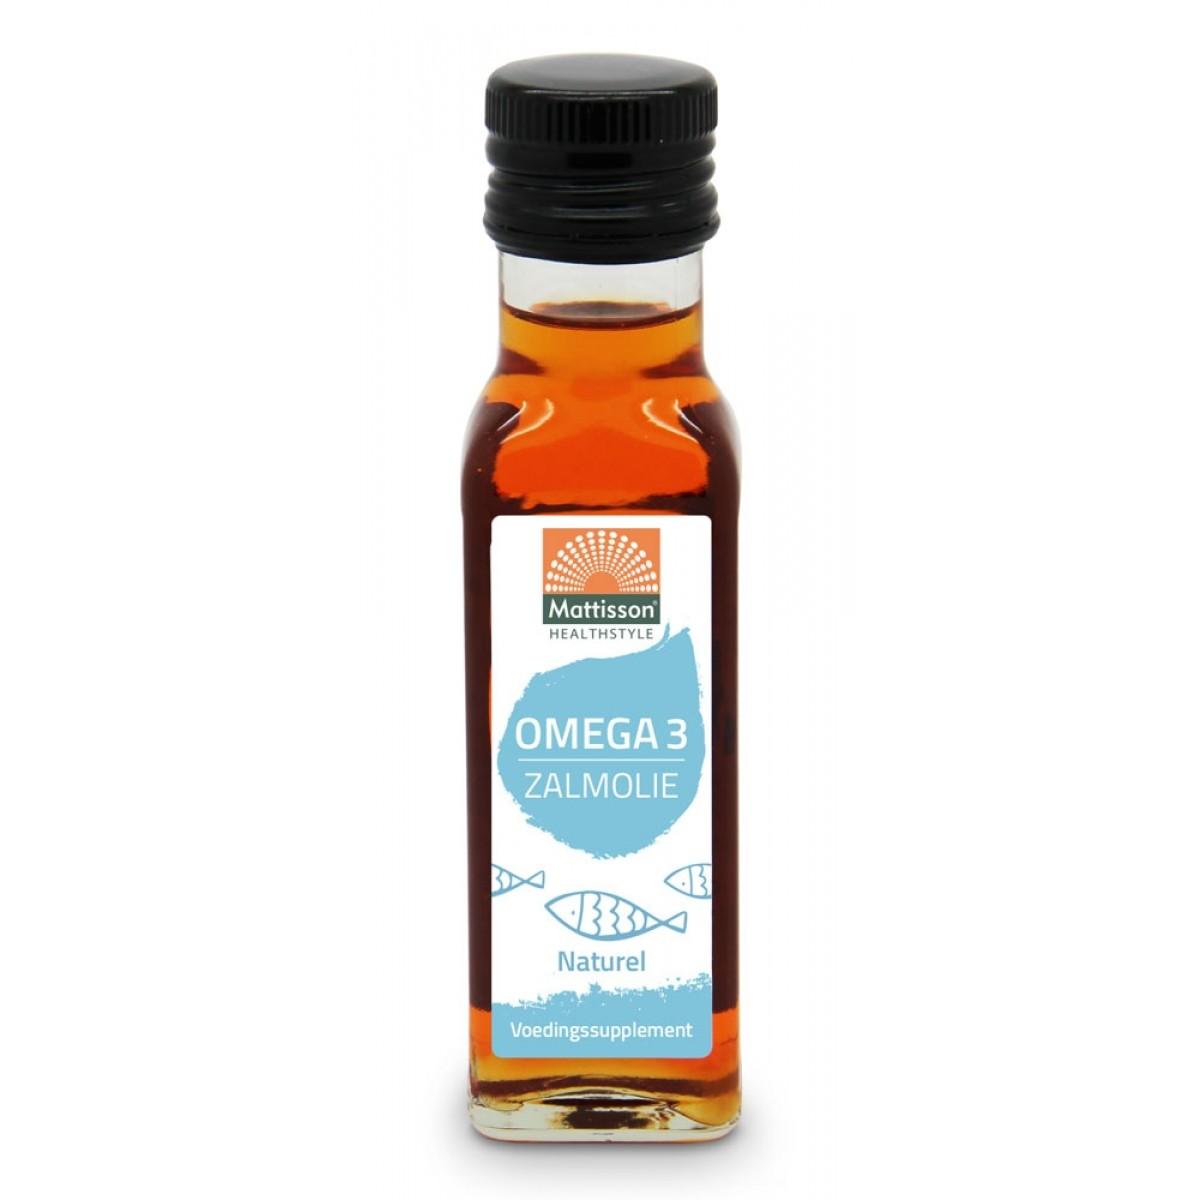 Omega-3 Zalmolie Naturel